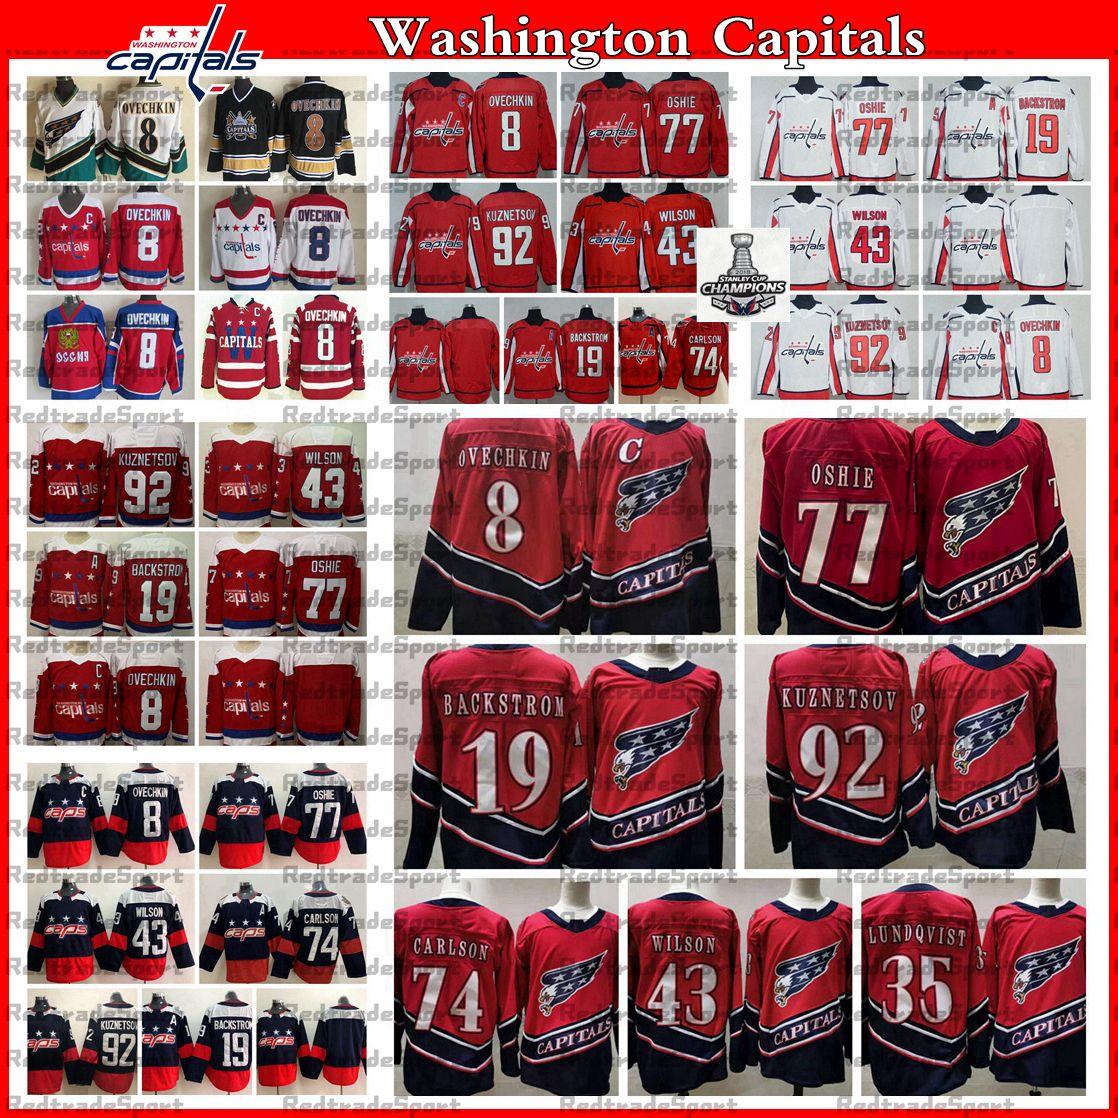 2021 Reverse Retro Washington Capitals 8 Alex Ovechkin TJ Oshie Evgeny Kuznetsov 백스트롬 Wilson Carlson Lundqvist 챔피언 하키 유니폼